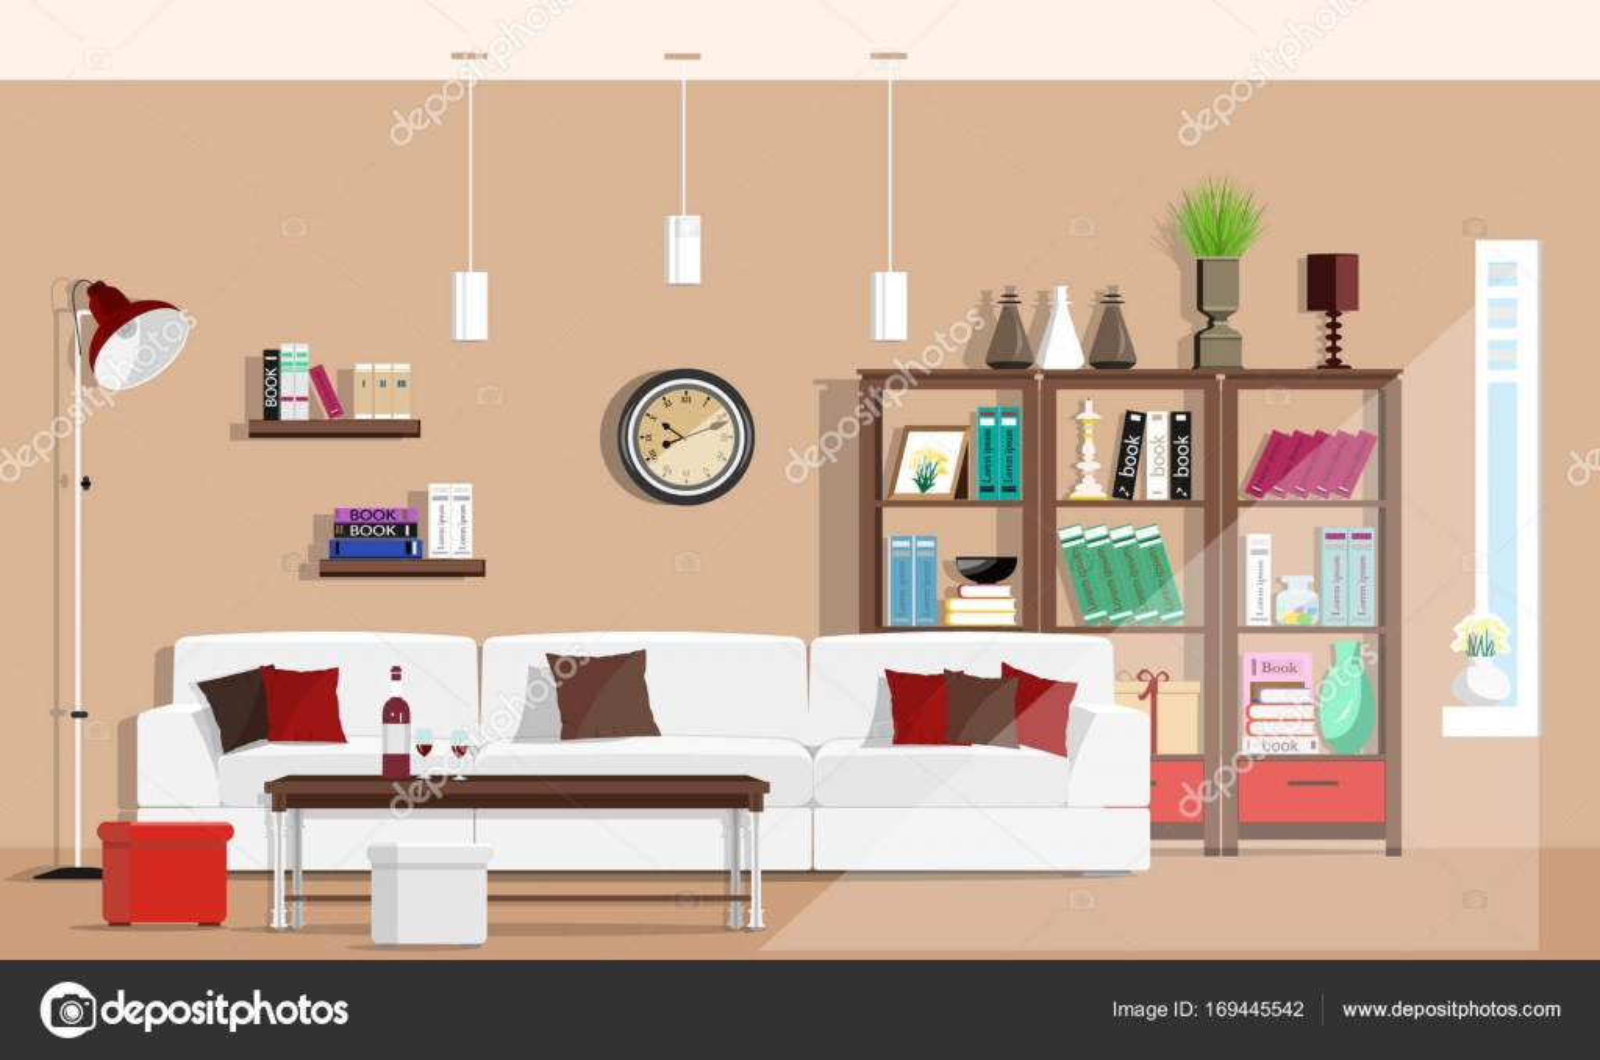 Fresco salón gráfico diseño de interiores con muebles: sofá, sillas ...